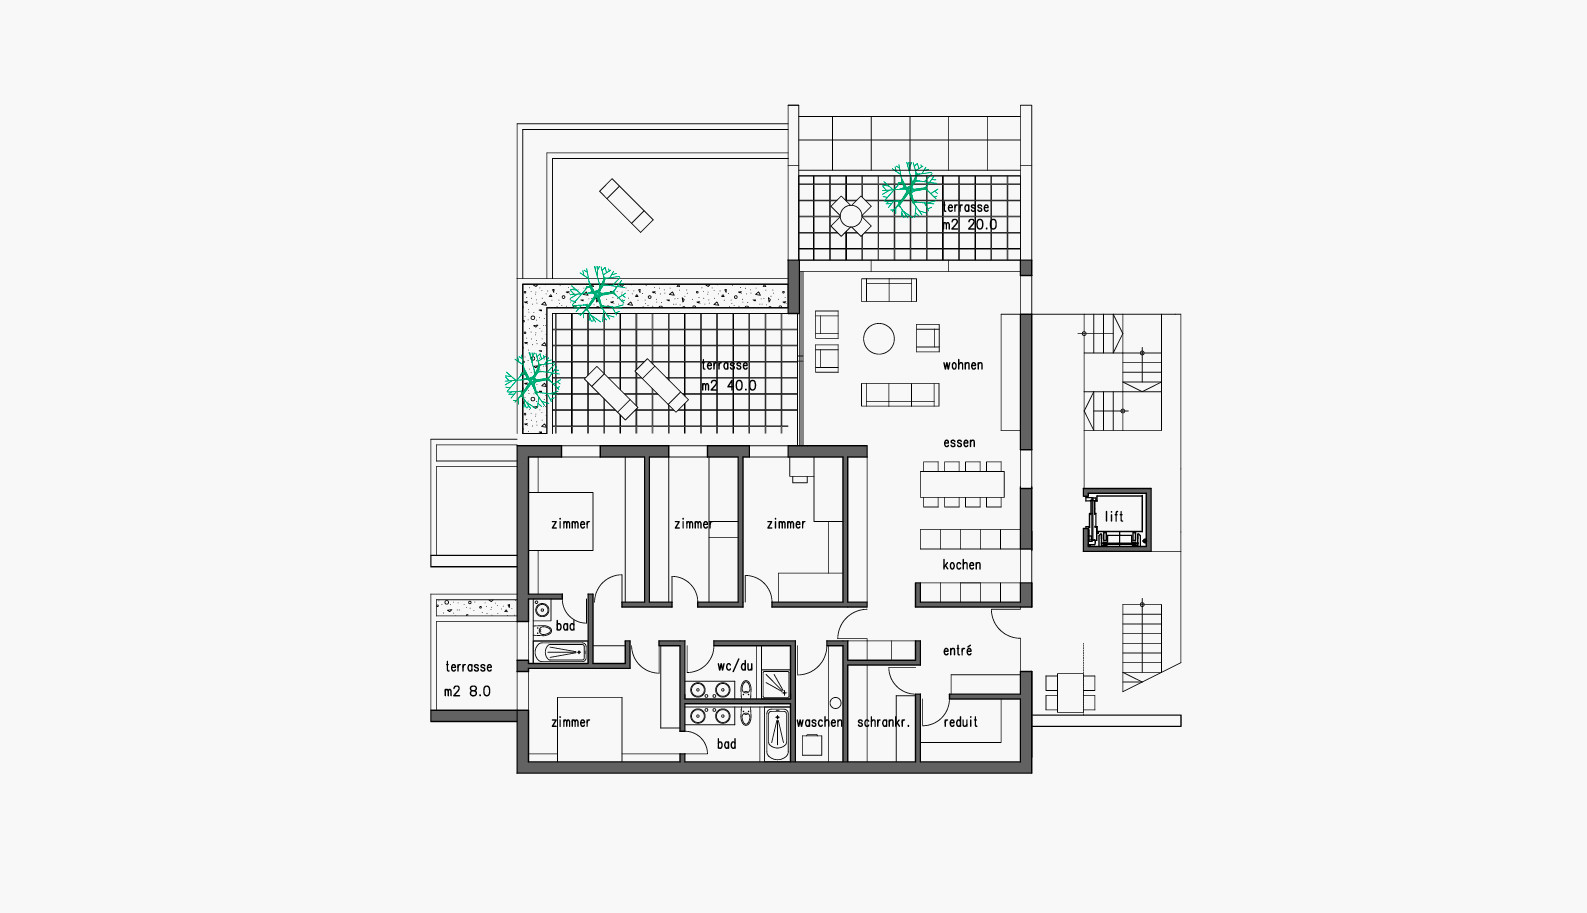 ebene 2 – mittleres terrassenhaus